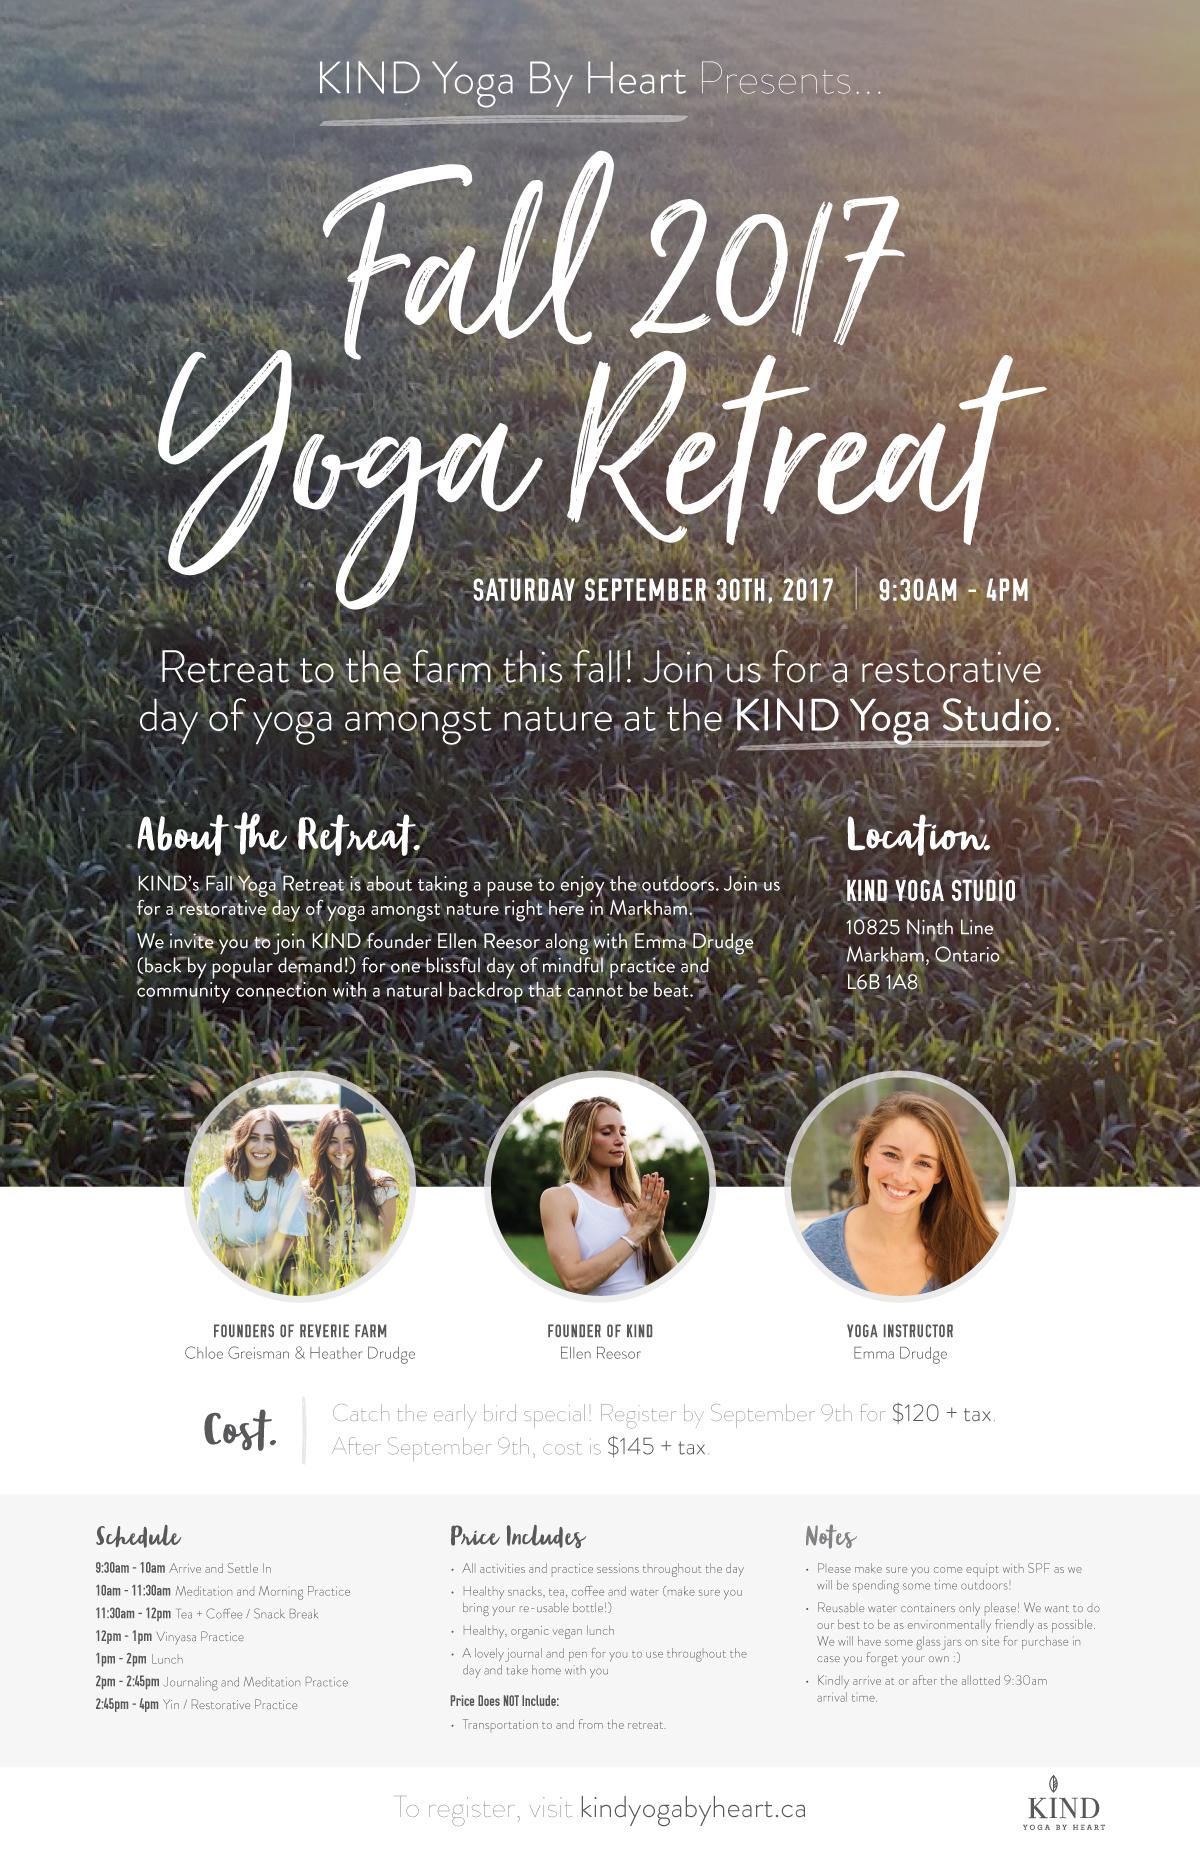 kind-yoga-fall-retreat-2017.jpg